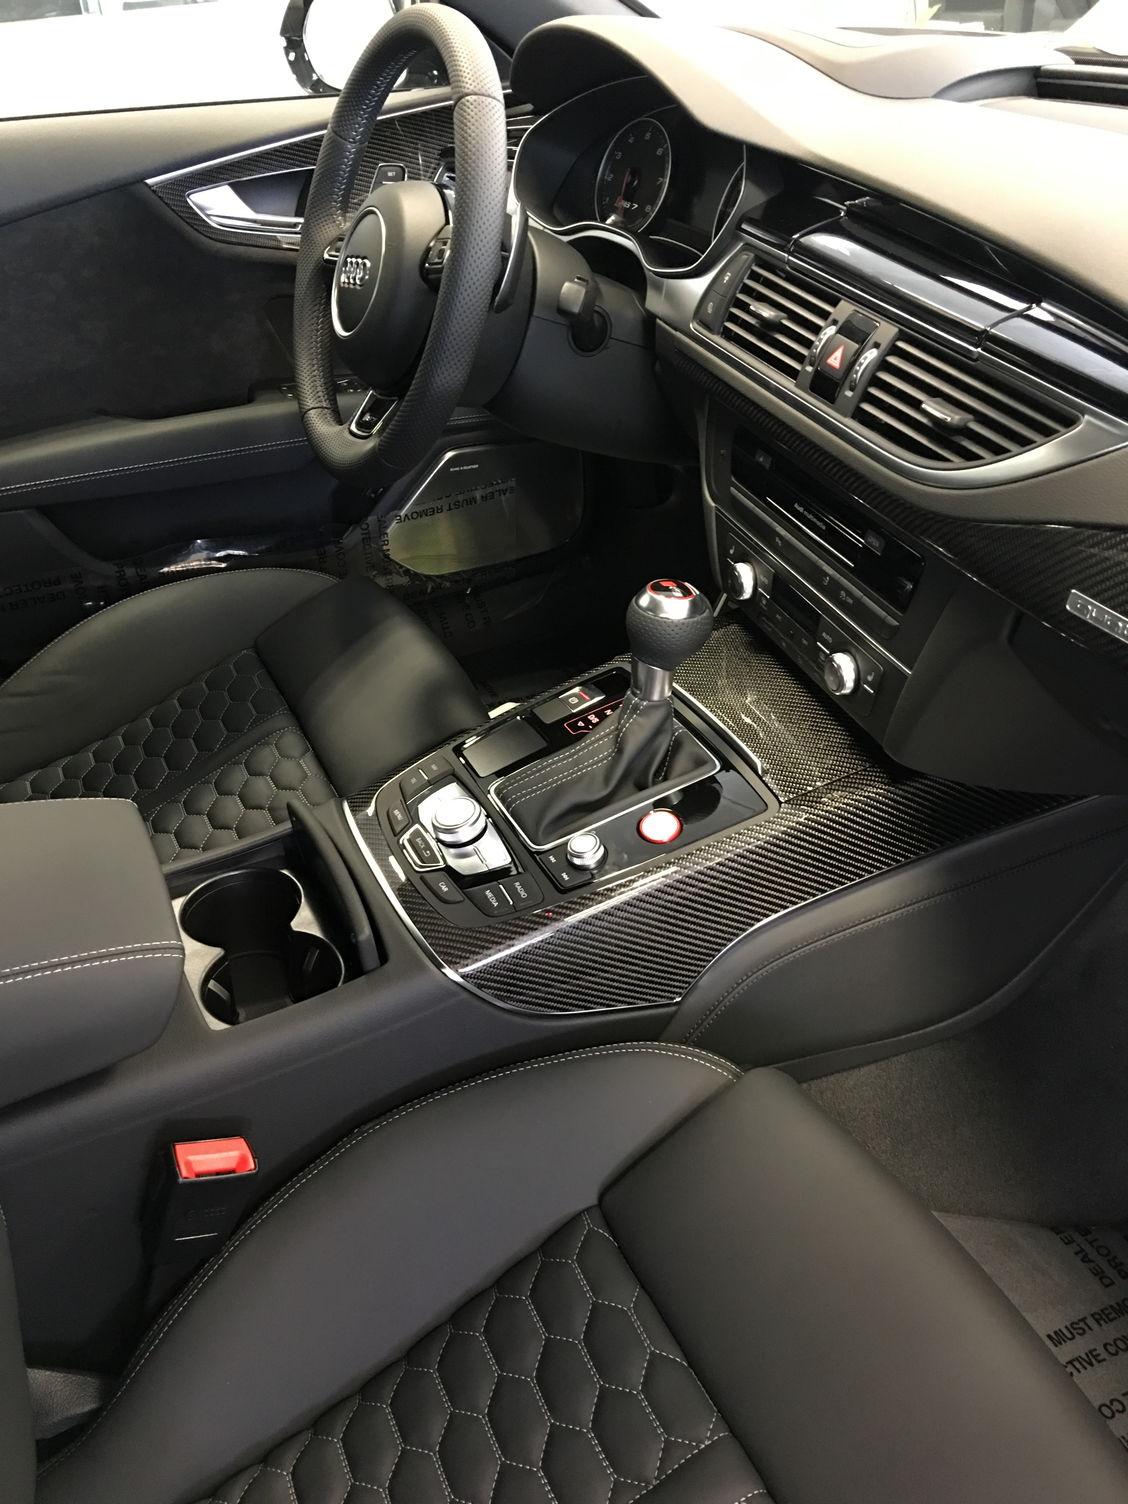 Audi Dealership Atlanta >> Audi Other Nardo Gray 2016 RS7 with Carbon Fiber ...